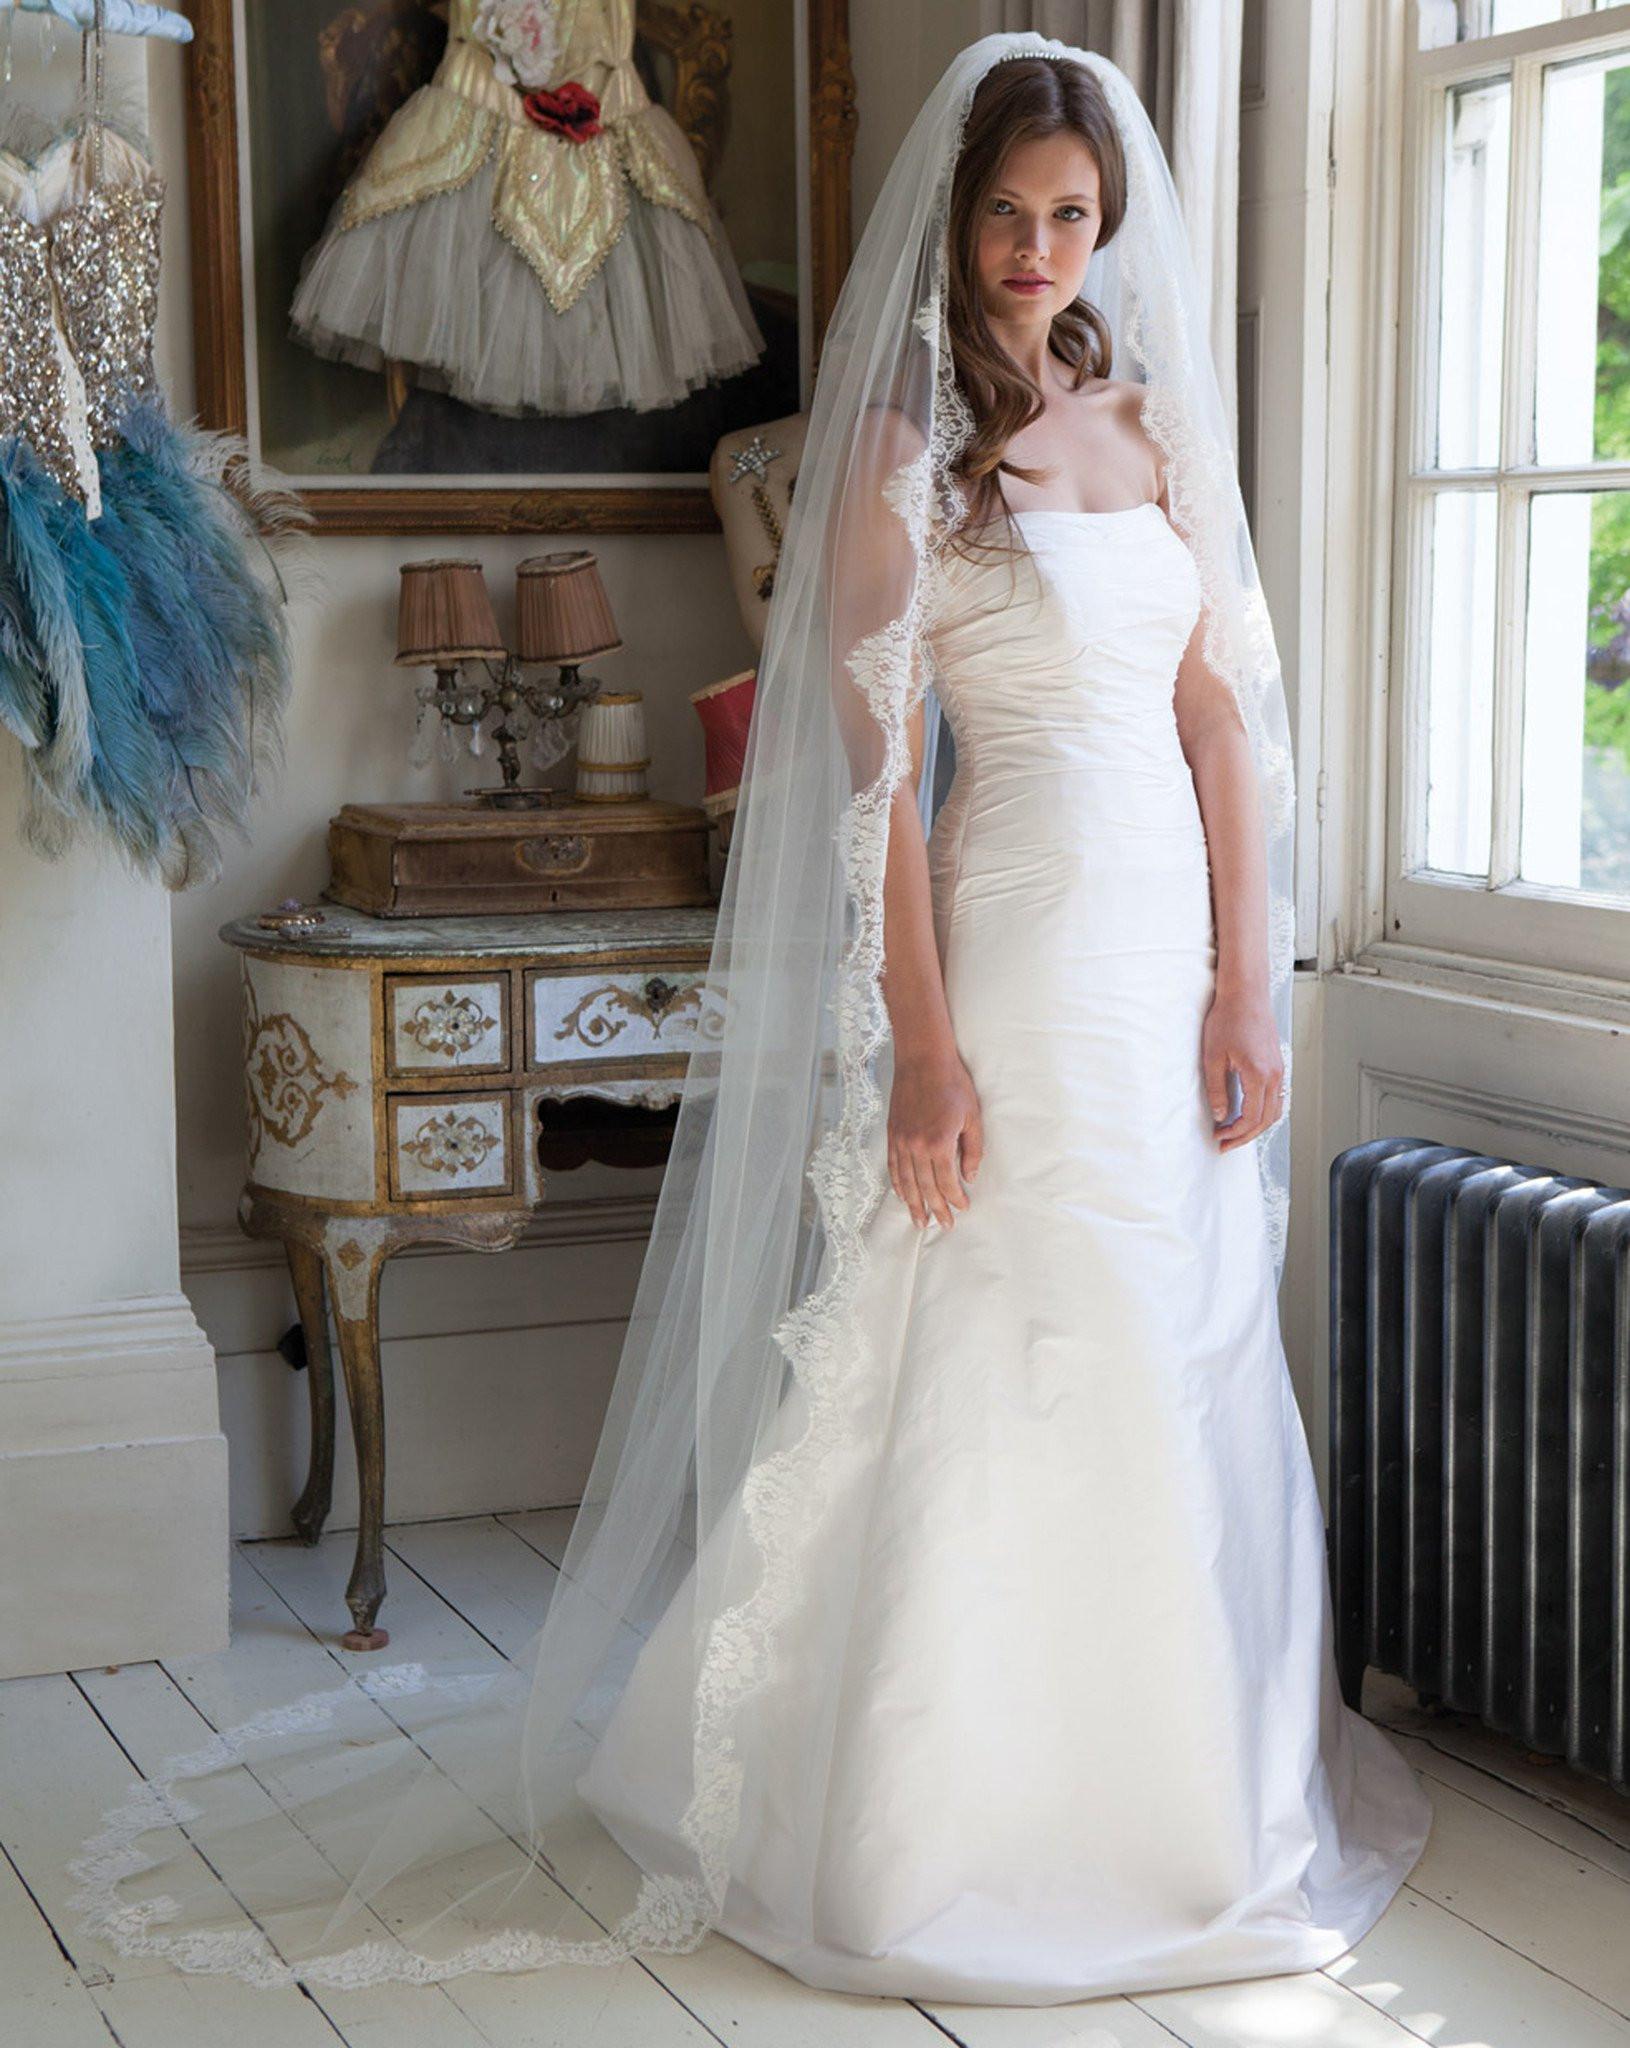 Lace Trim Wedding Veil  Veil train length with chantilly lace trim Spellbinder